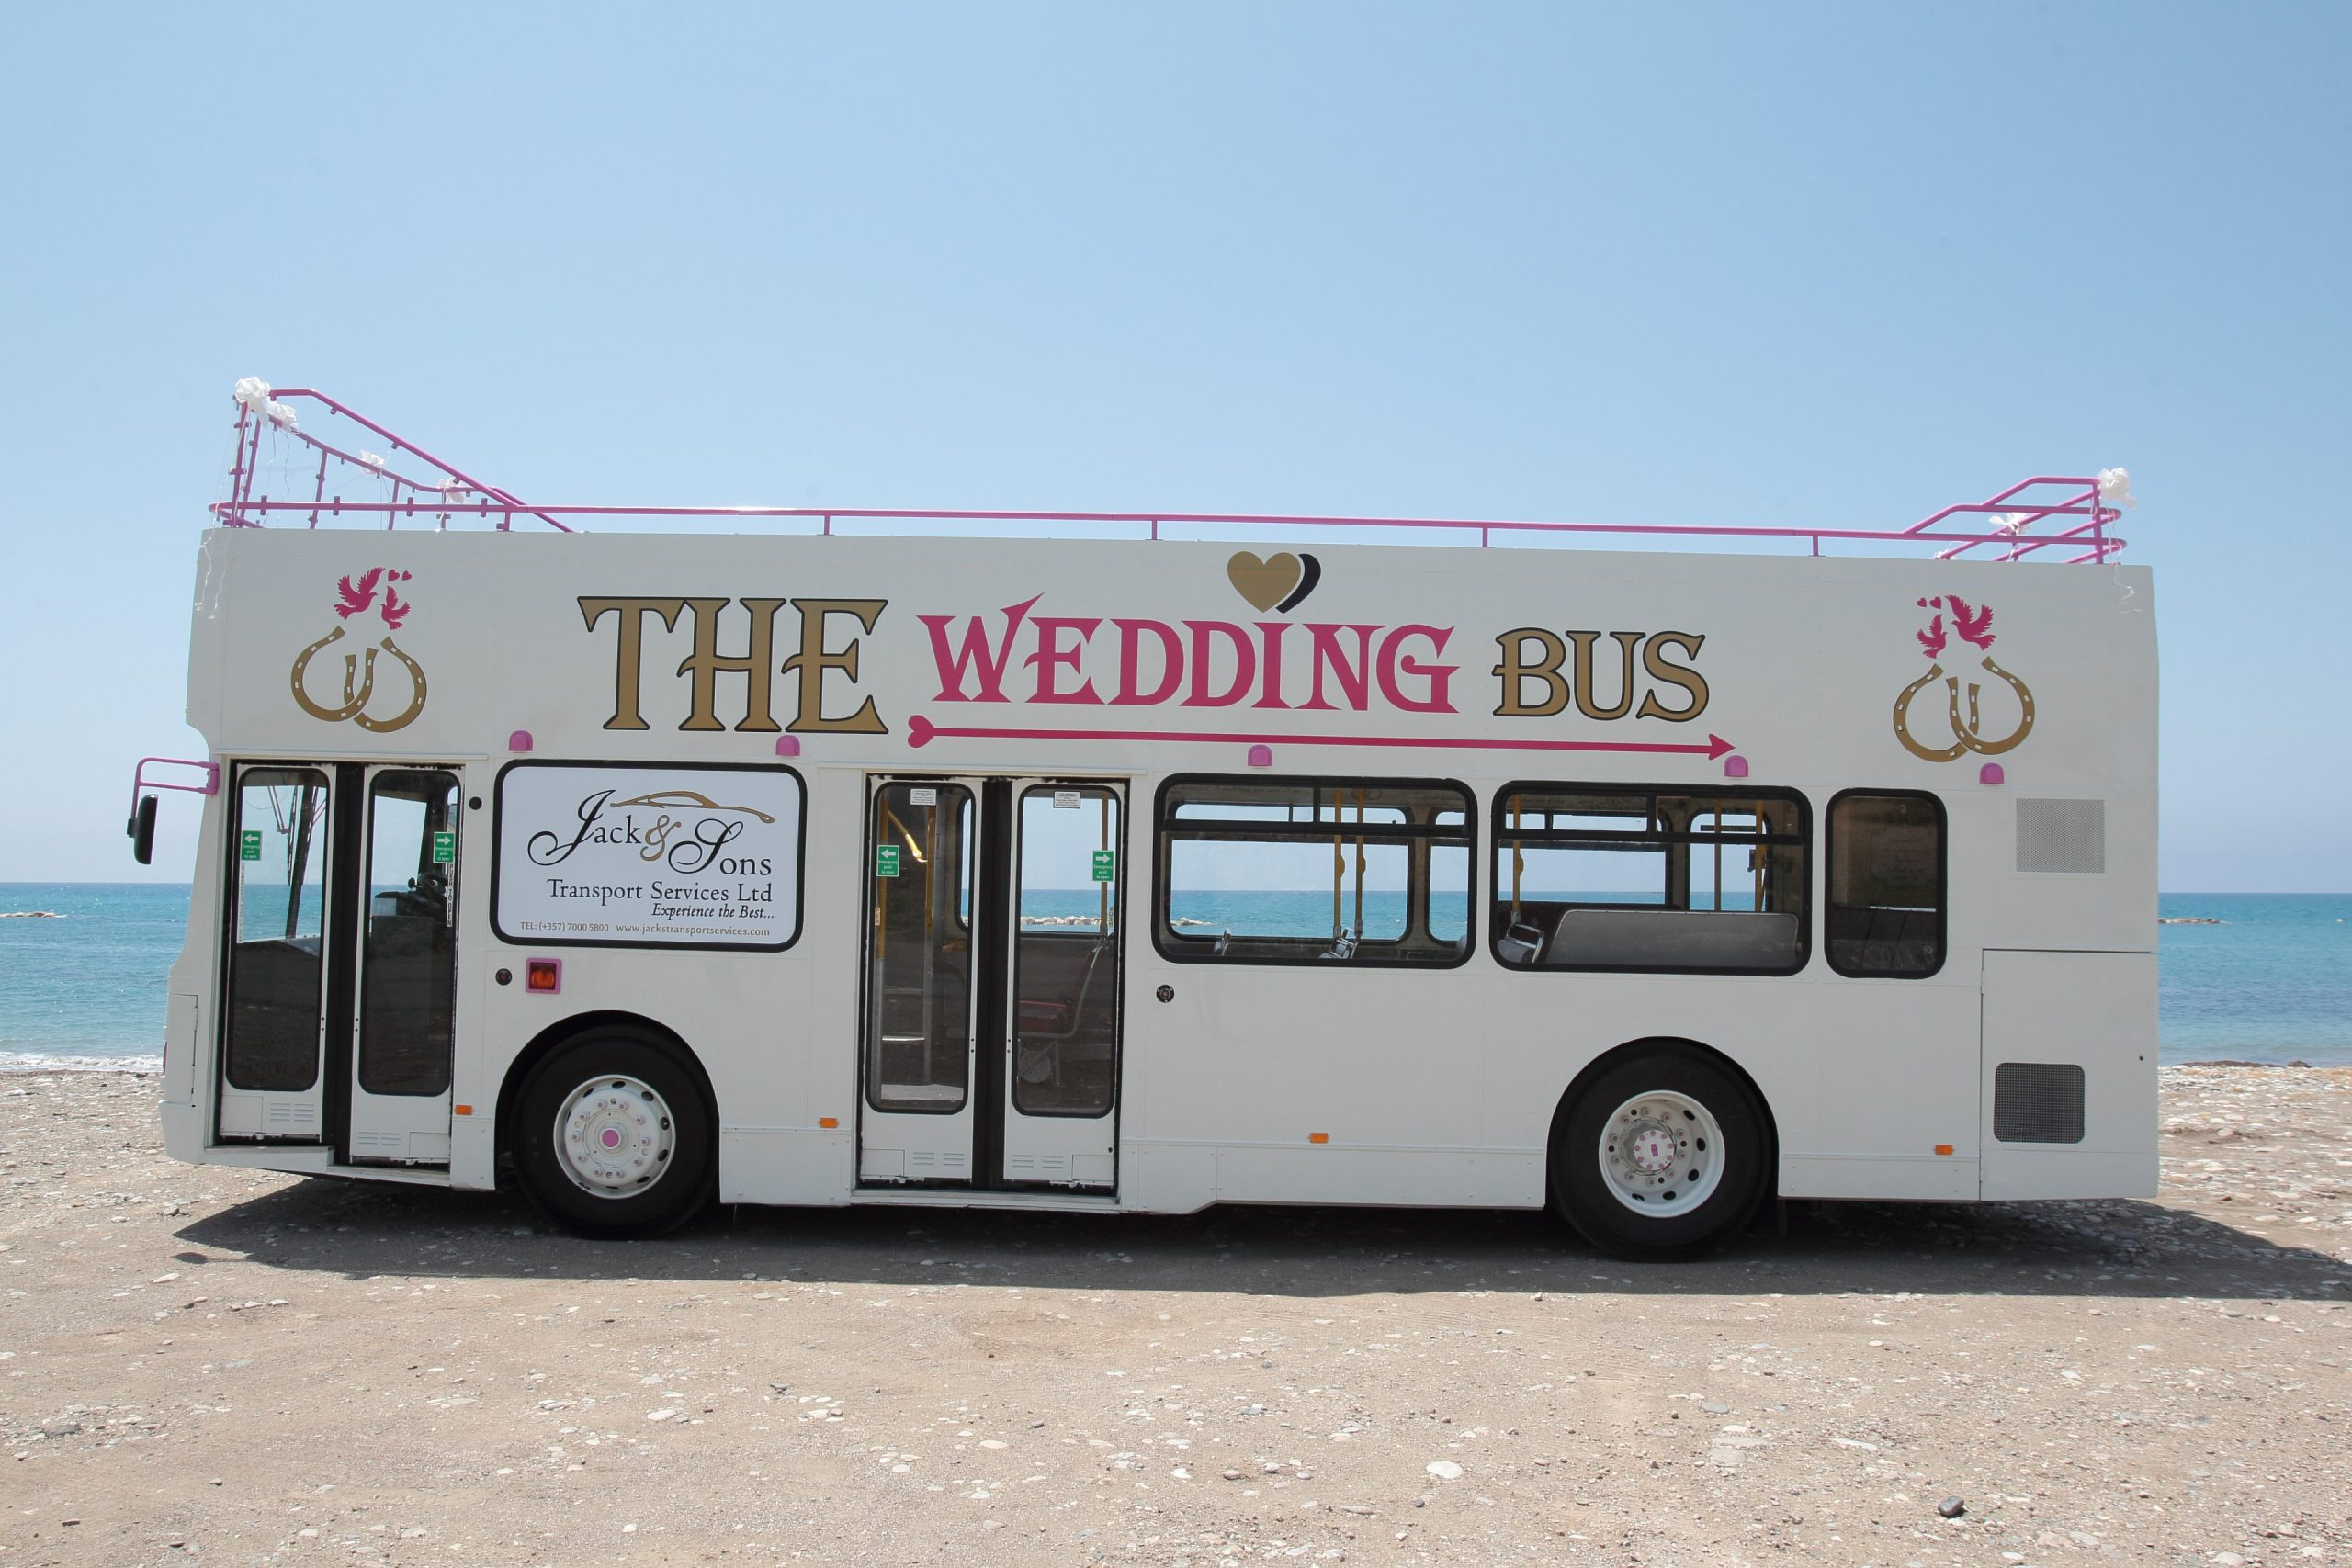 White open topped double decker bus